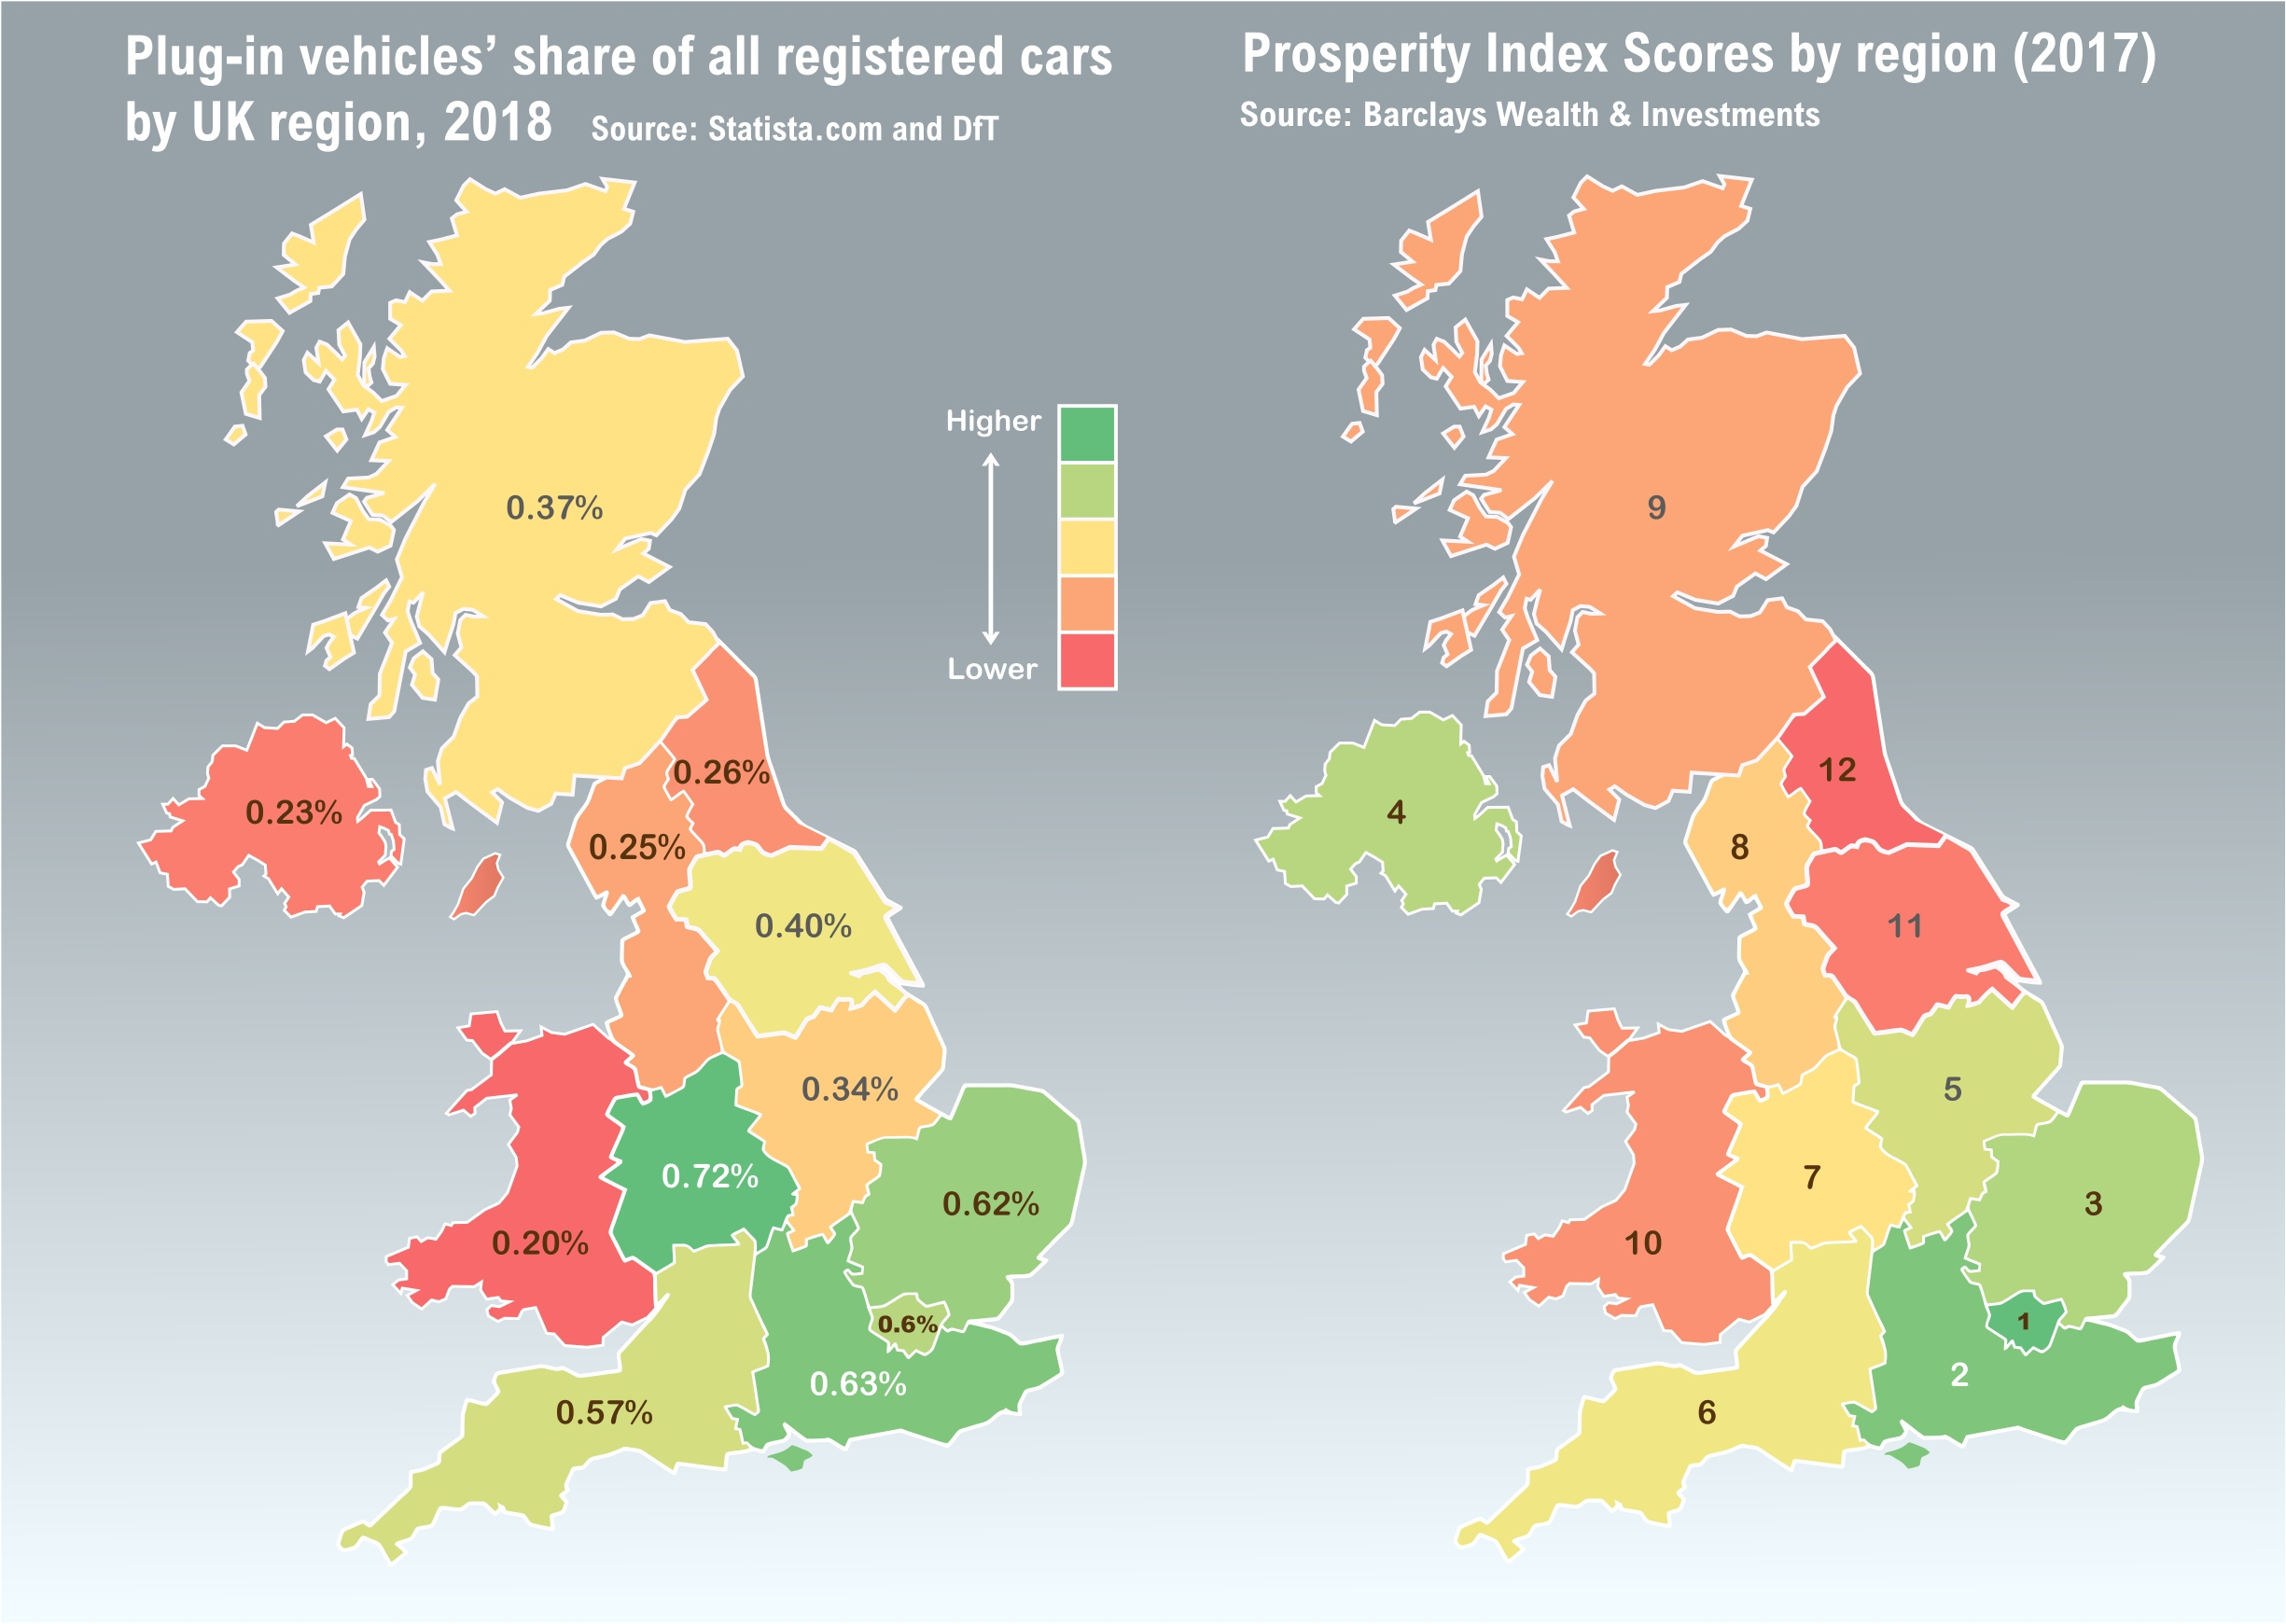 Green regions = highest prosperity/EV registrations